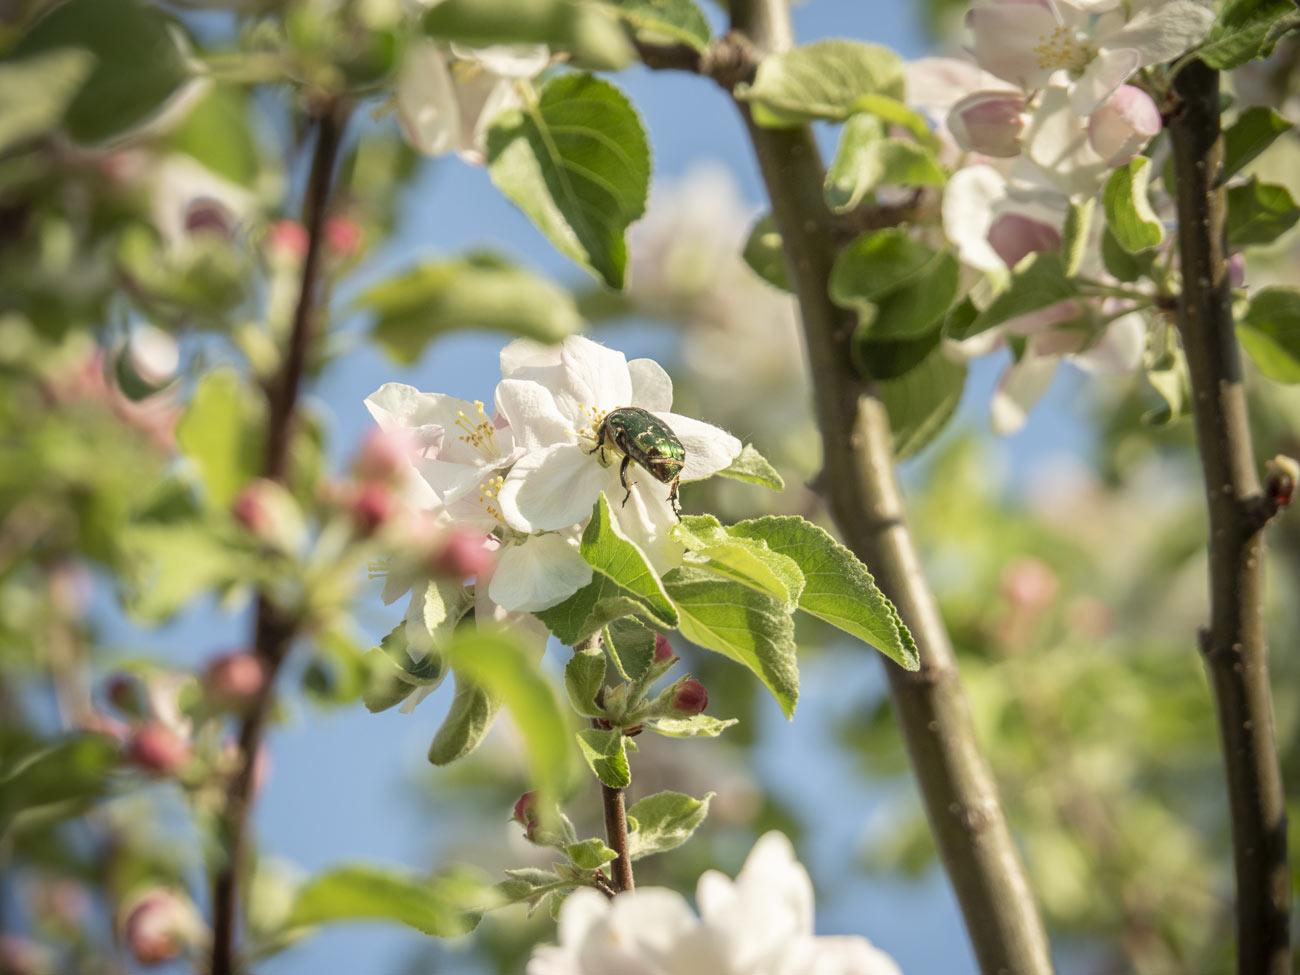 Viele Obstbäume blühen jetzt